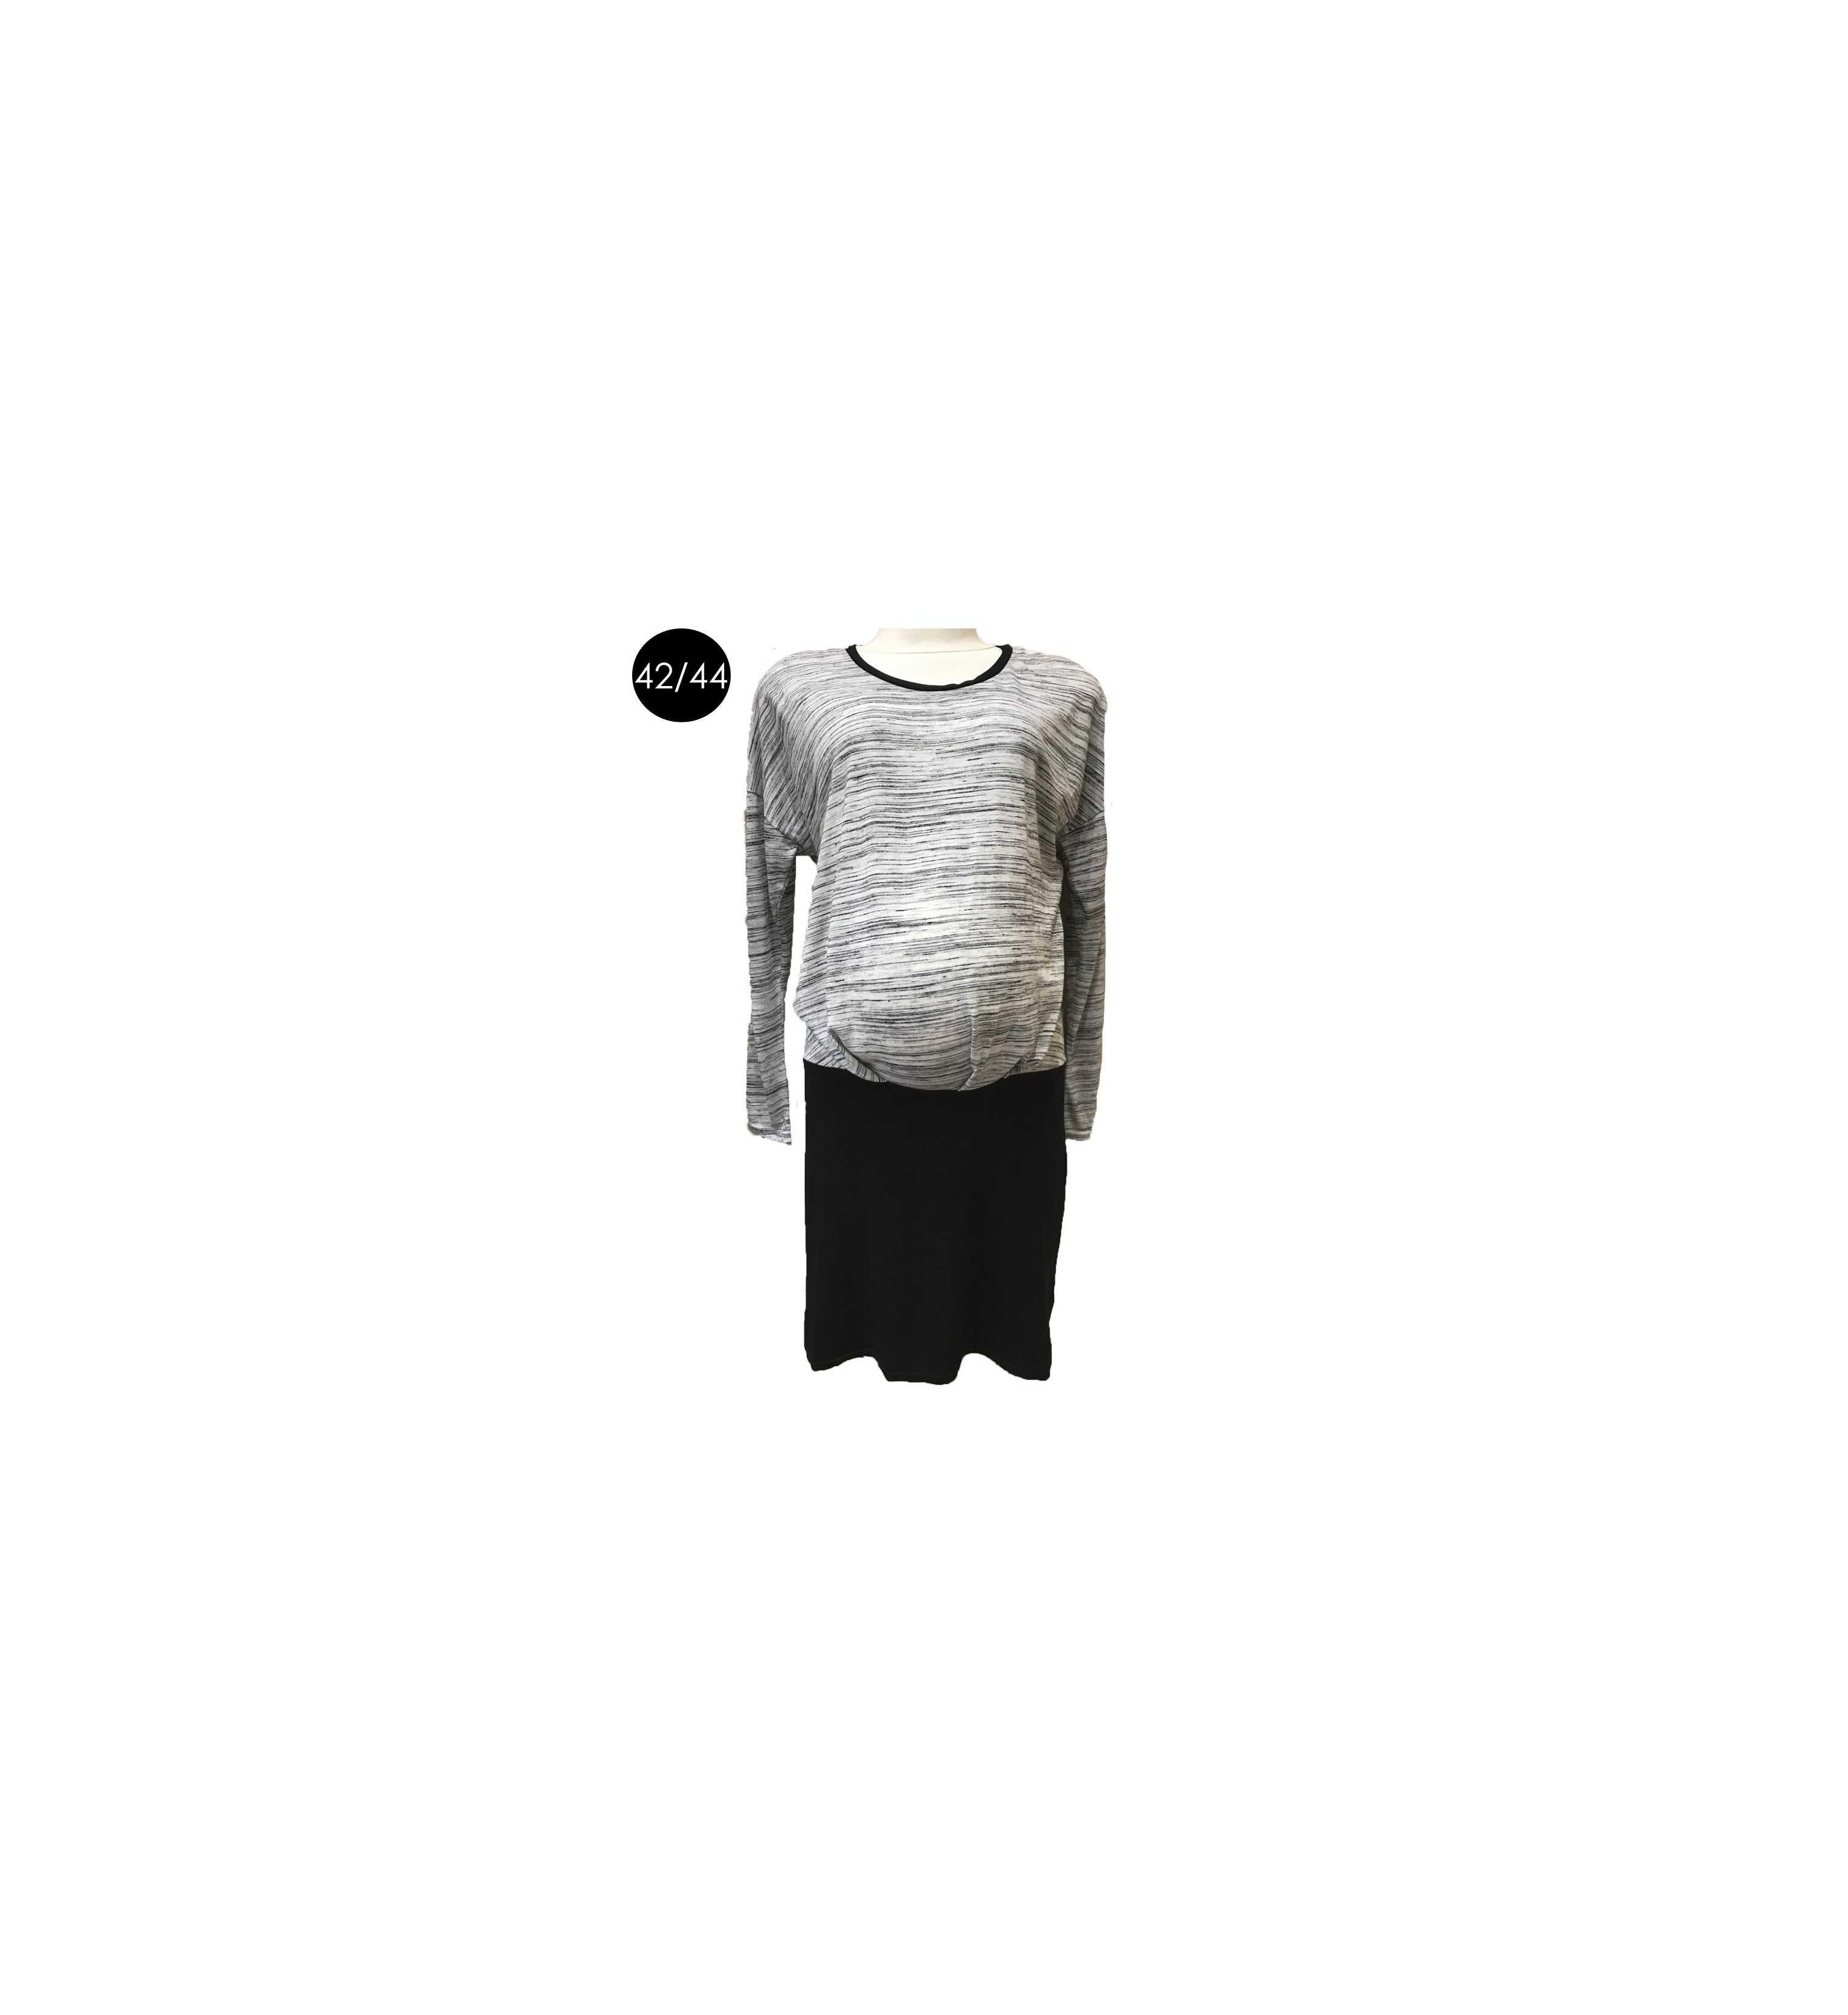 Robe bicolore femme enceinte